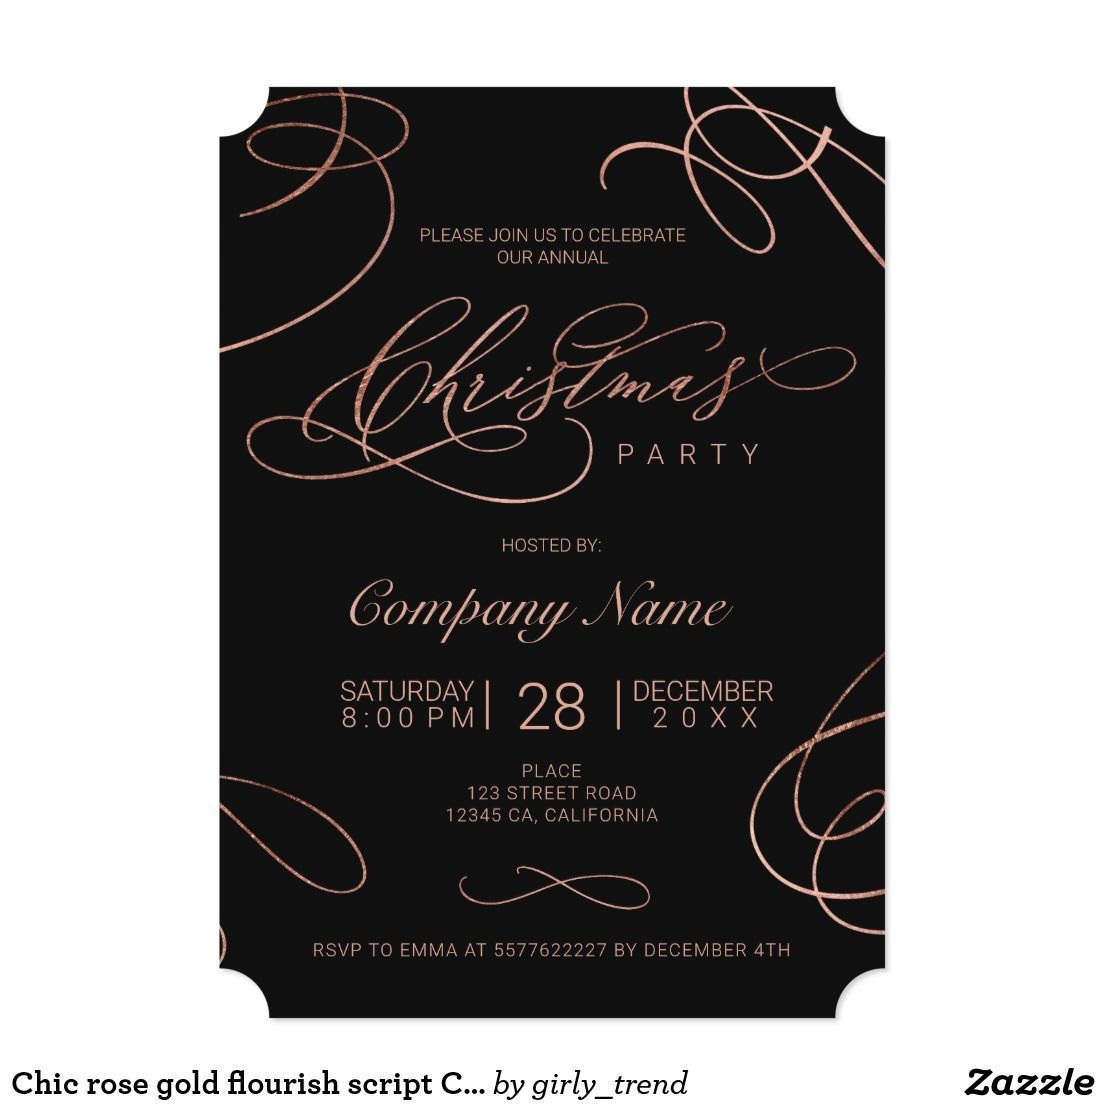 Chic rose gold flourish script Christmas corporate Invitation #christmasinvitations #holidayinvitations #corporateevents #winterevent